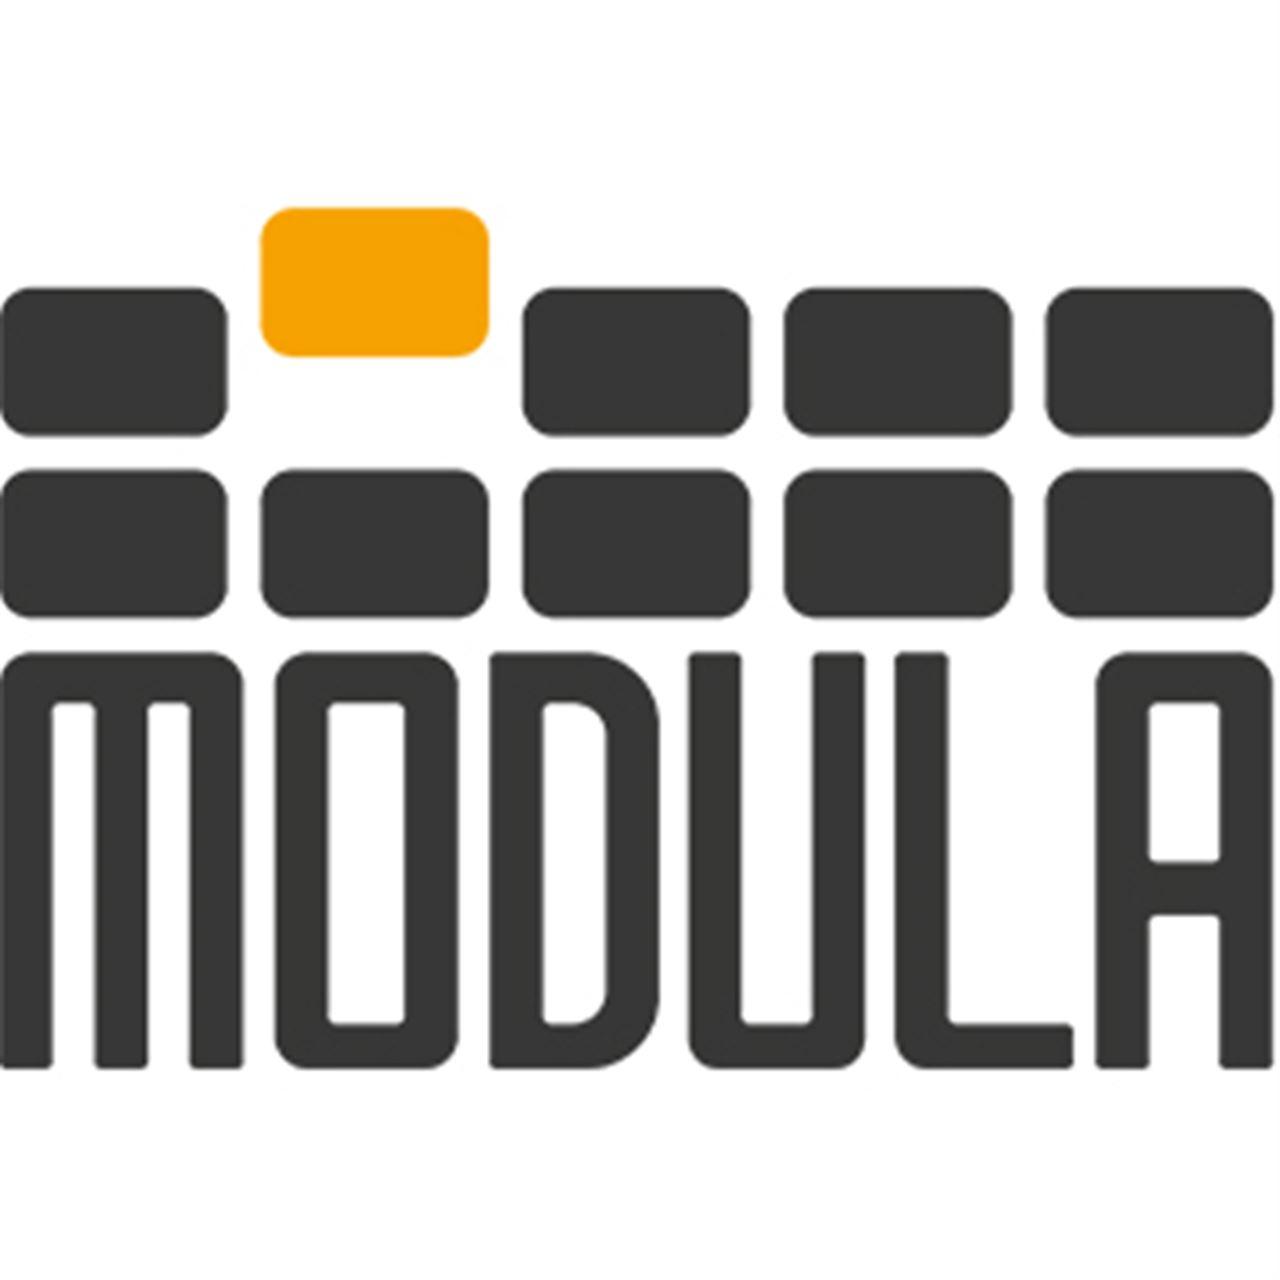 Modula S.p.a.